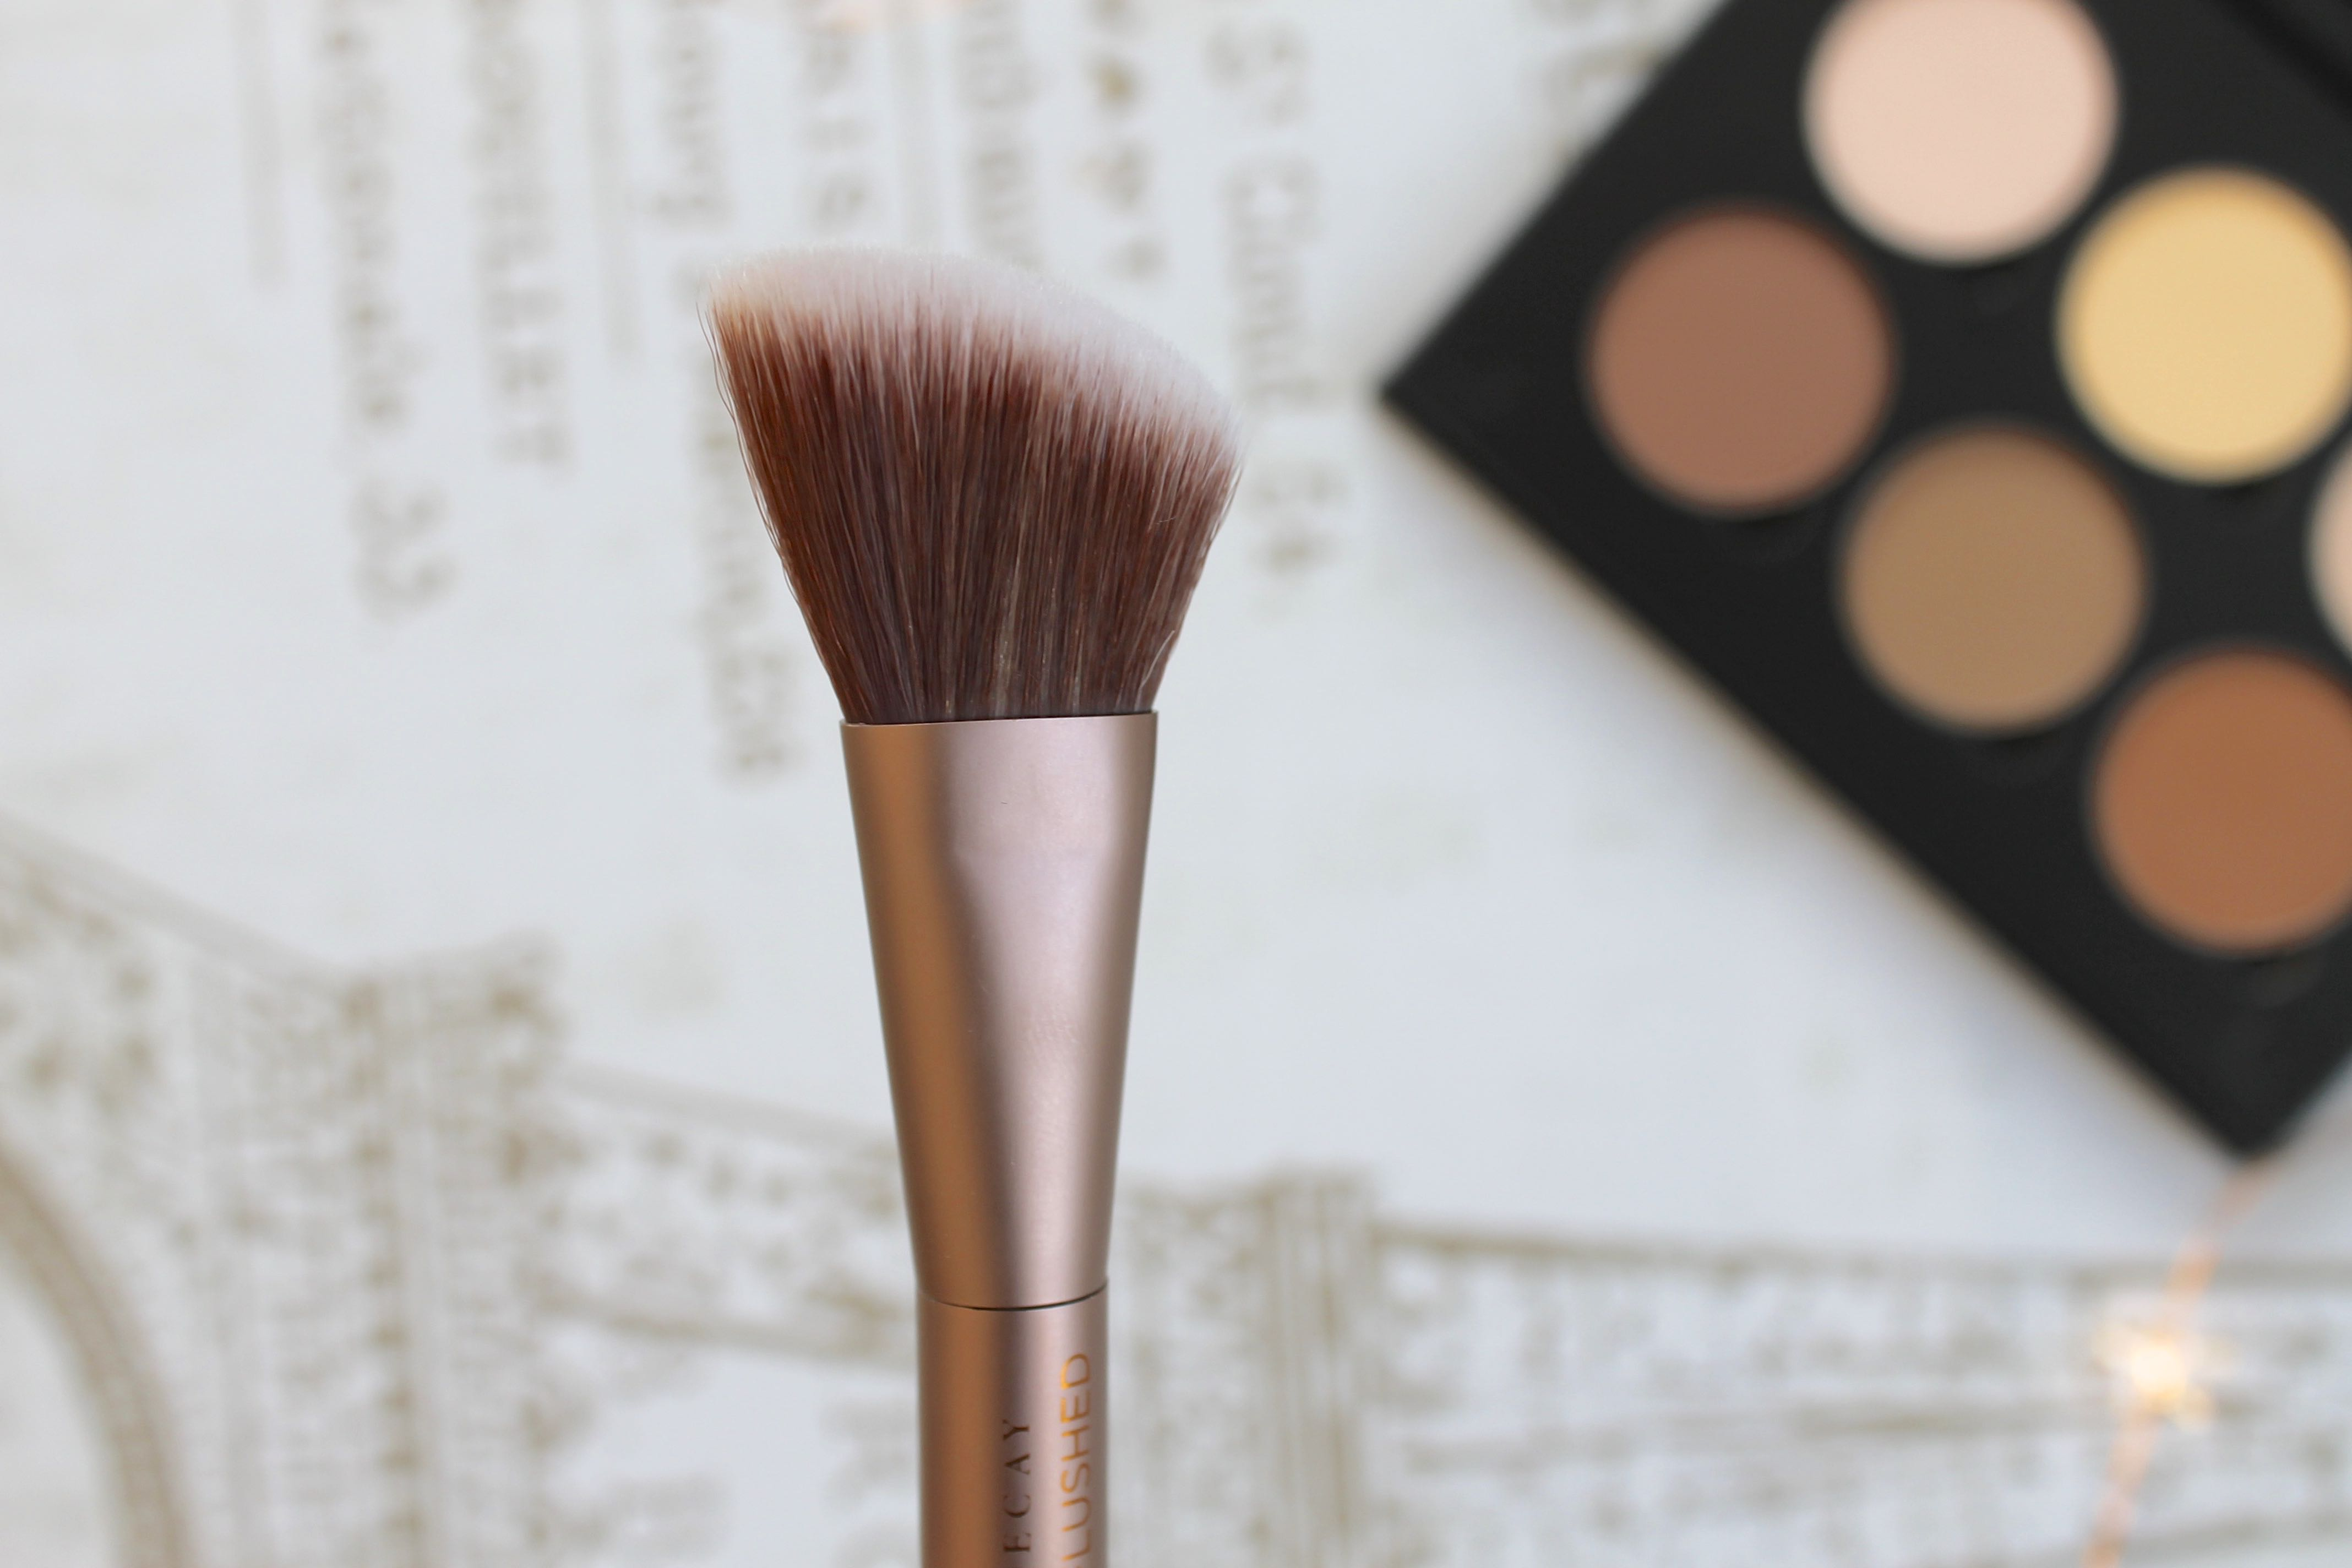 urban decay naked makeup brush